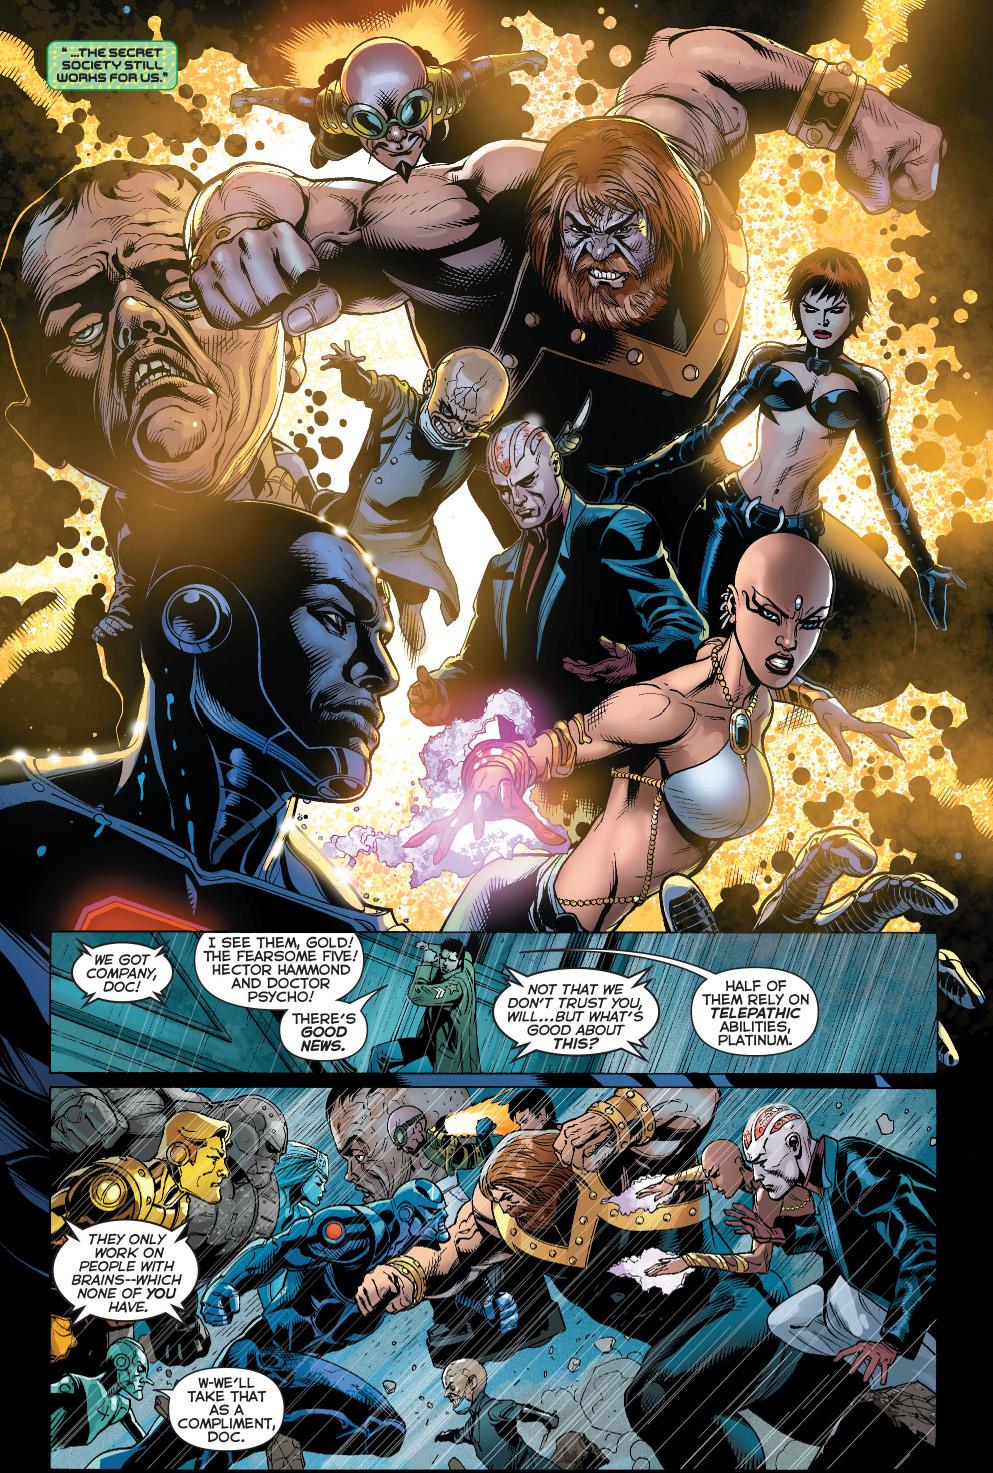 comicnewbies.files.wordpress.com/2015/01/the-metal-men-vs-the-fearsome-five-1.jpg